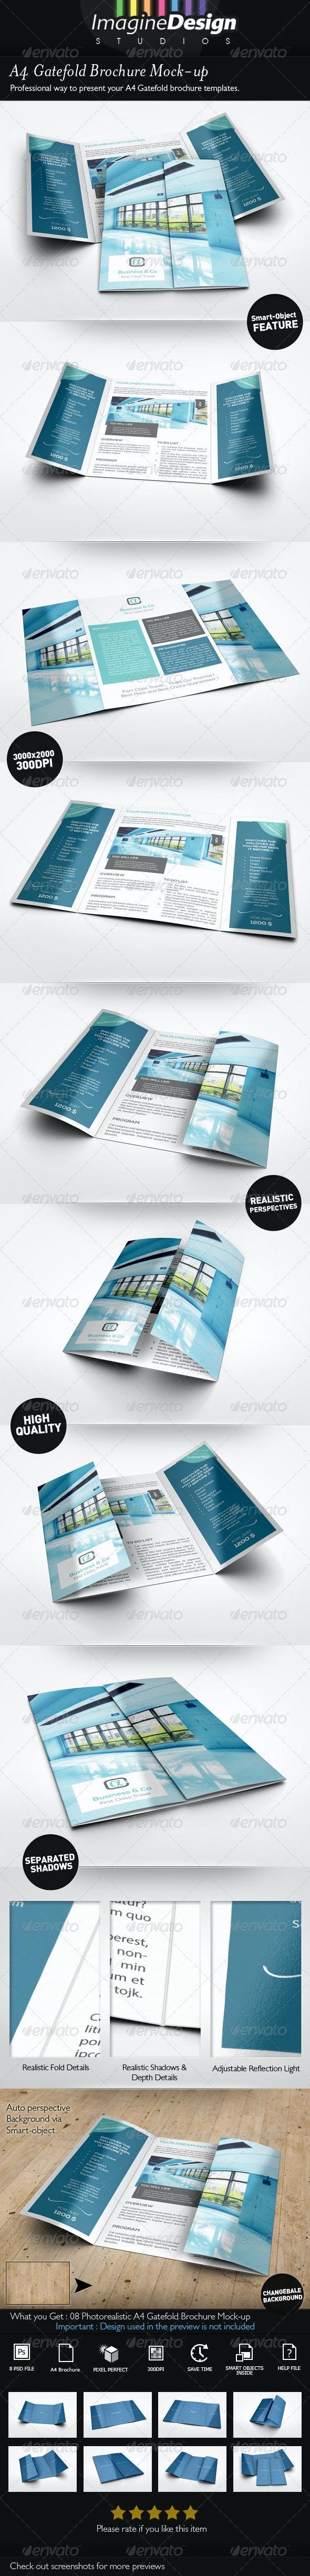 A4 Gatefold Brochure Mockup - Brochures Print